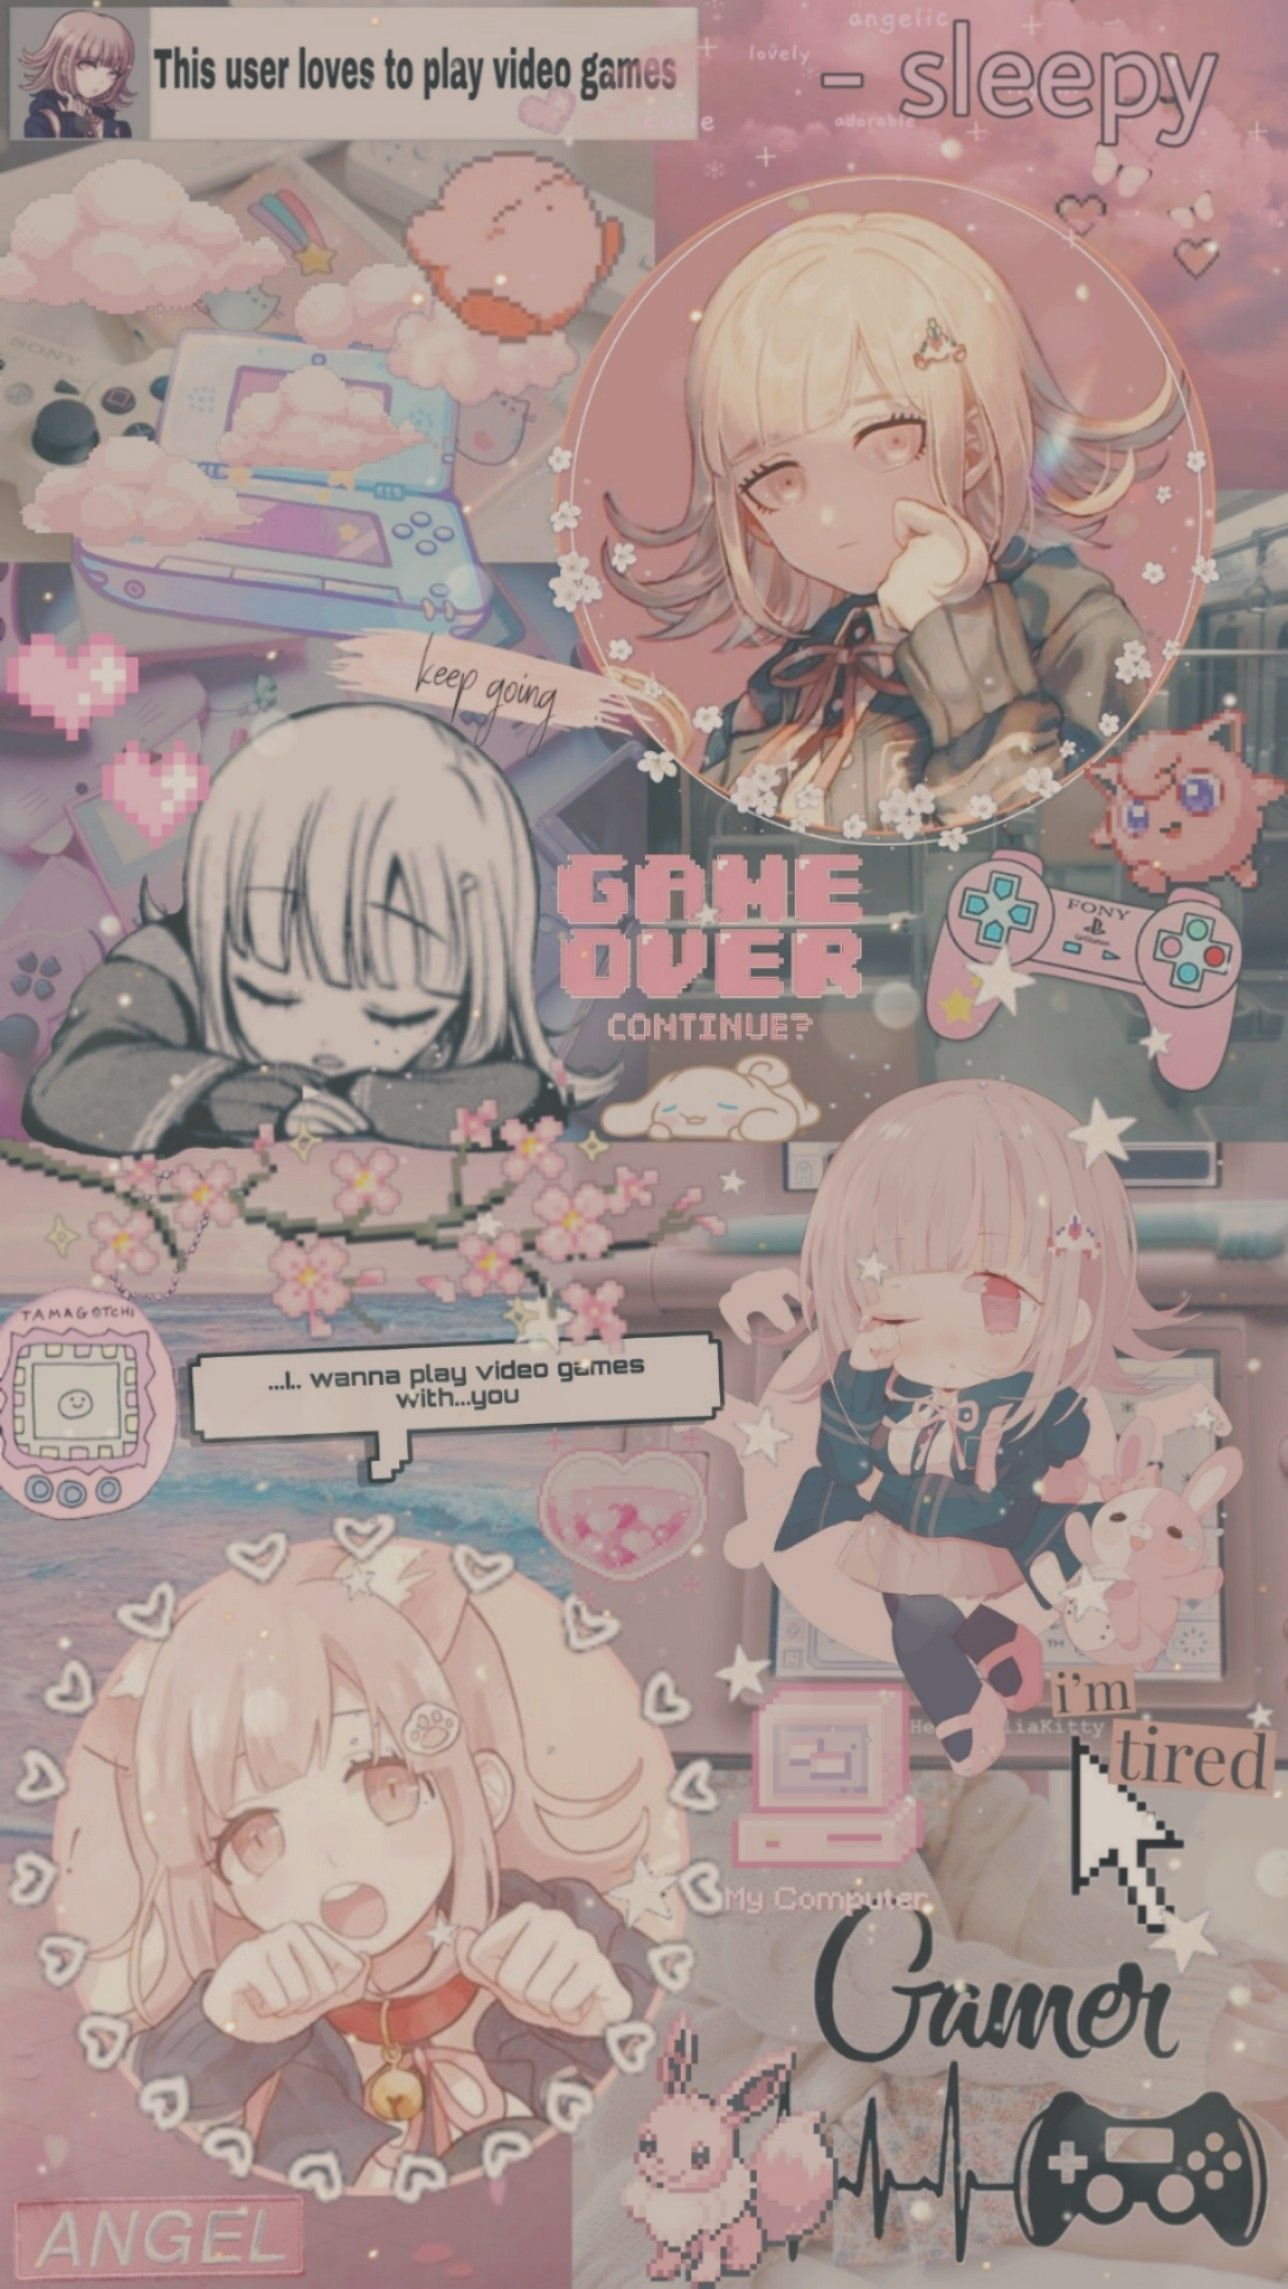 Chiaki Nanami Aesthetic Cute Anime Wallpaper Anime Wallpaper Iphone Aesthetic Anime